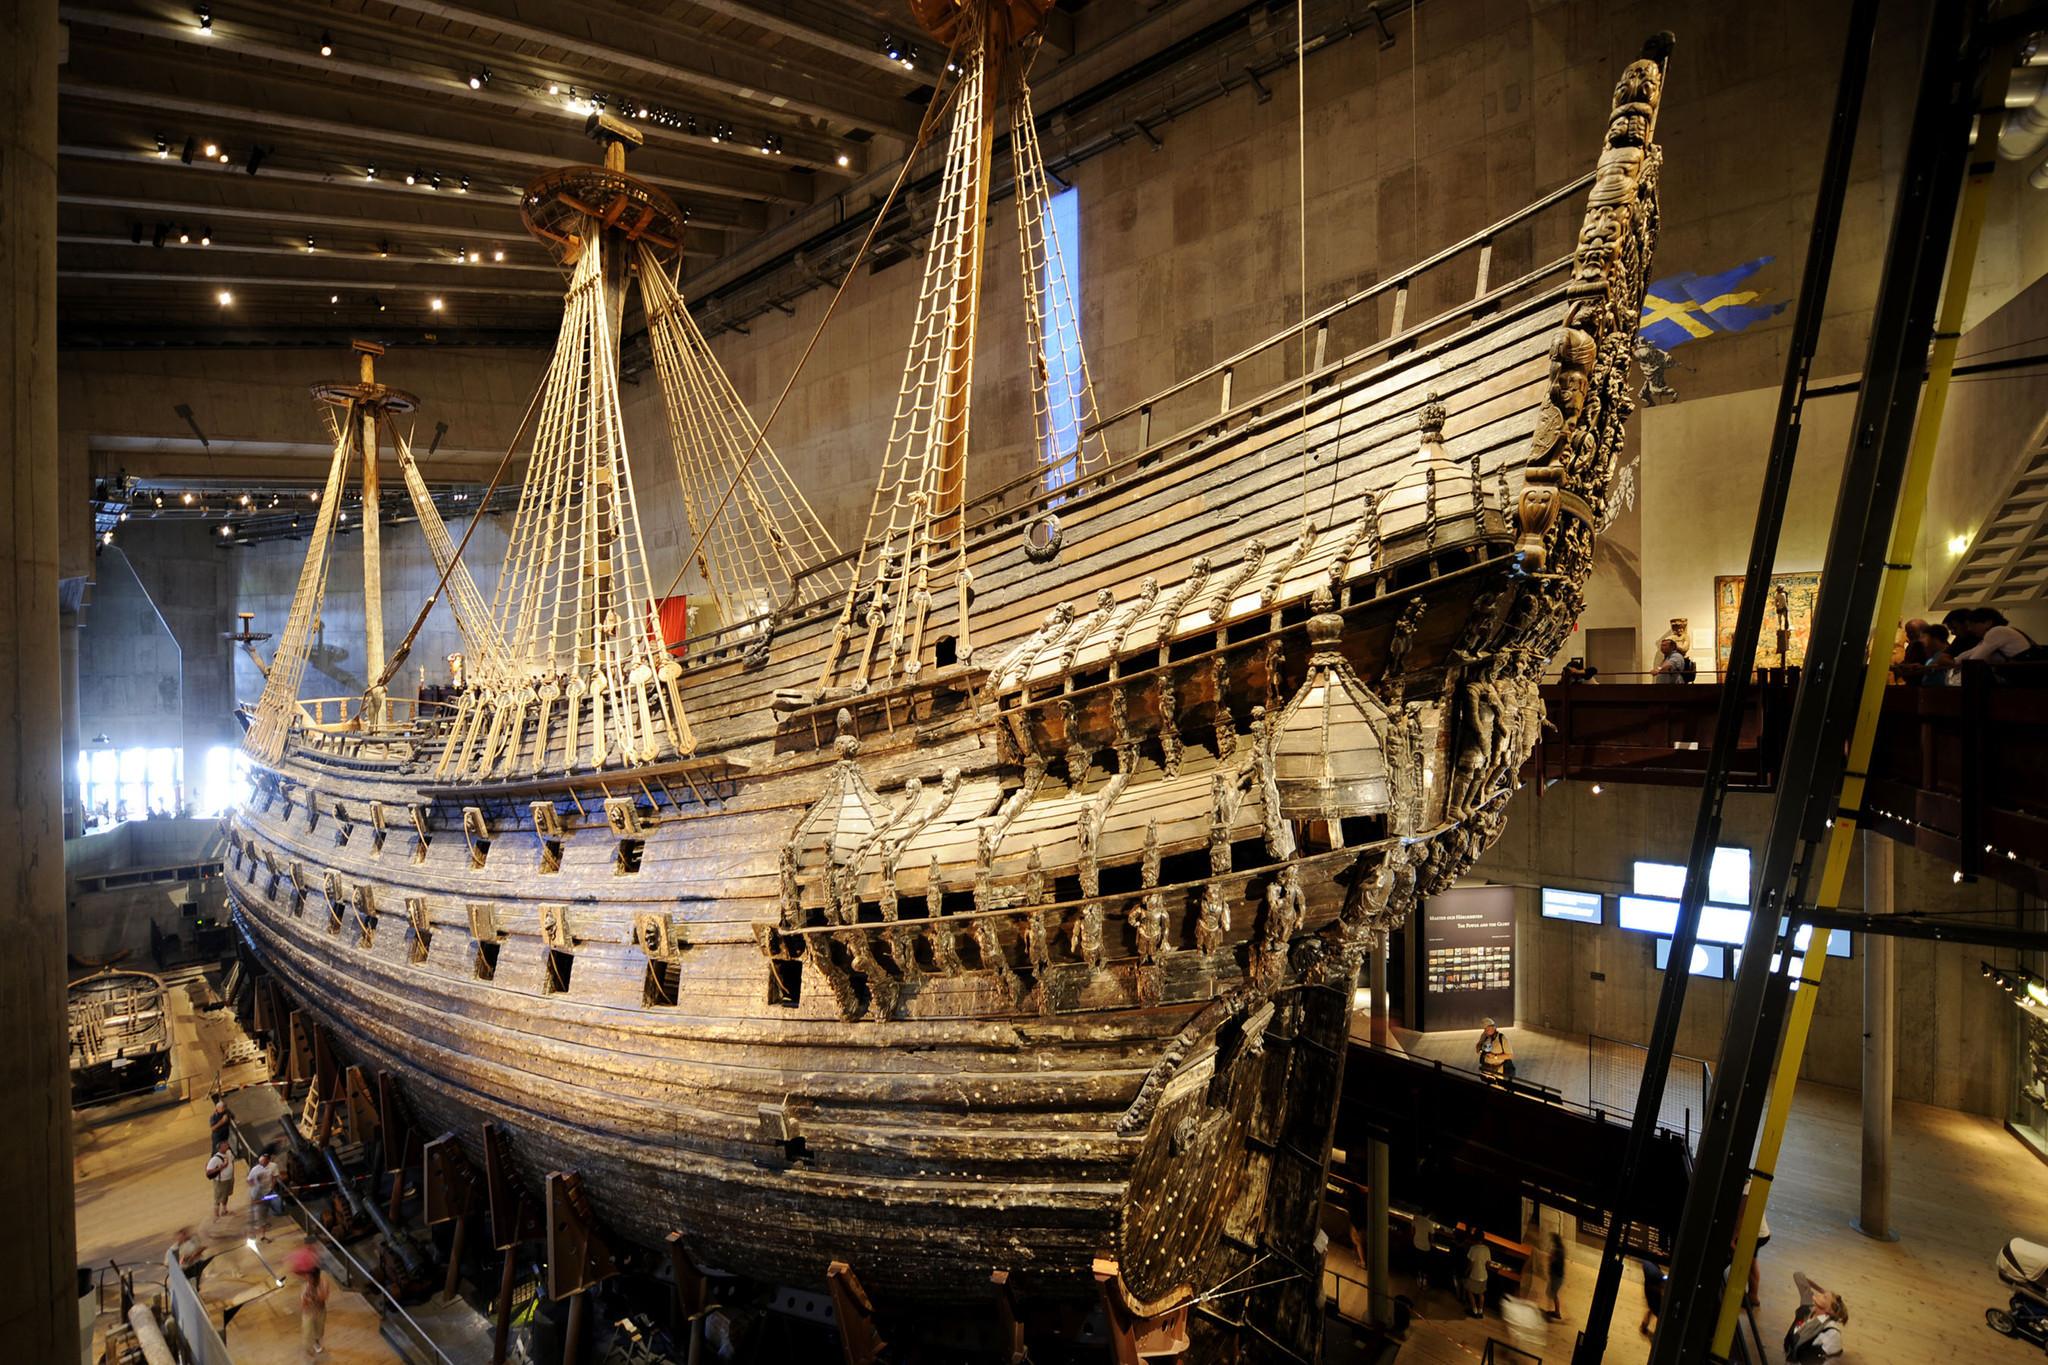 Vasa ship museum in stockholm sweden orlando sentinel for Vasa ship